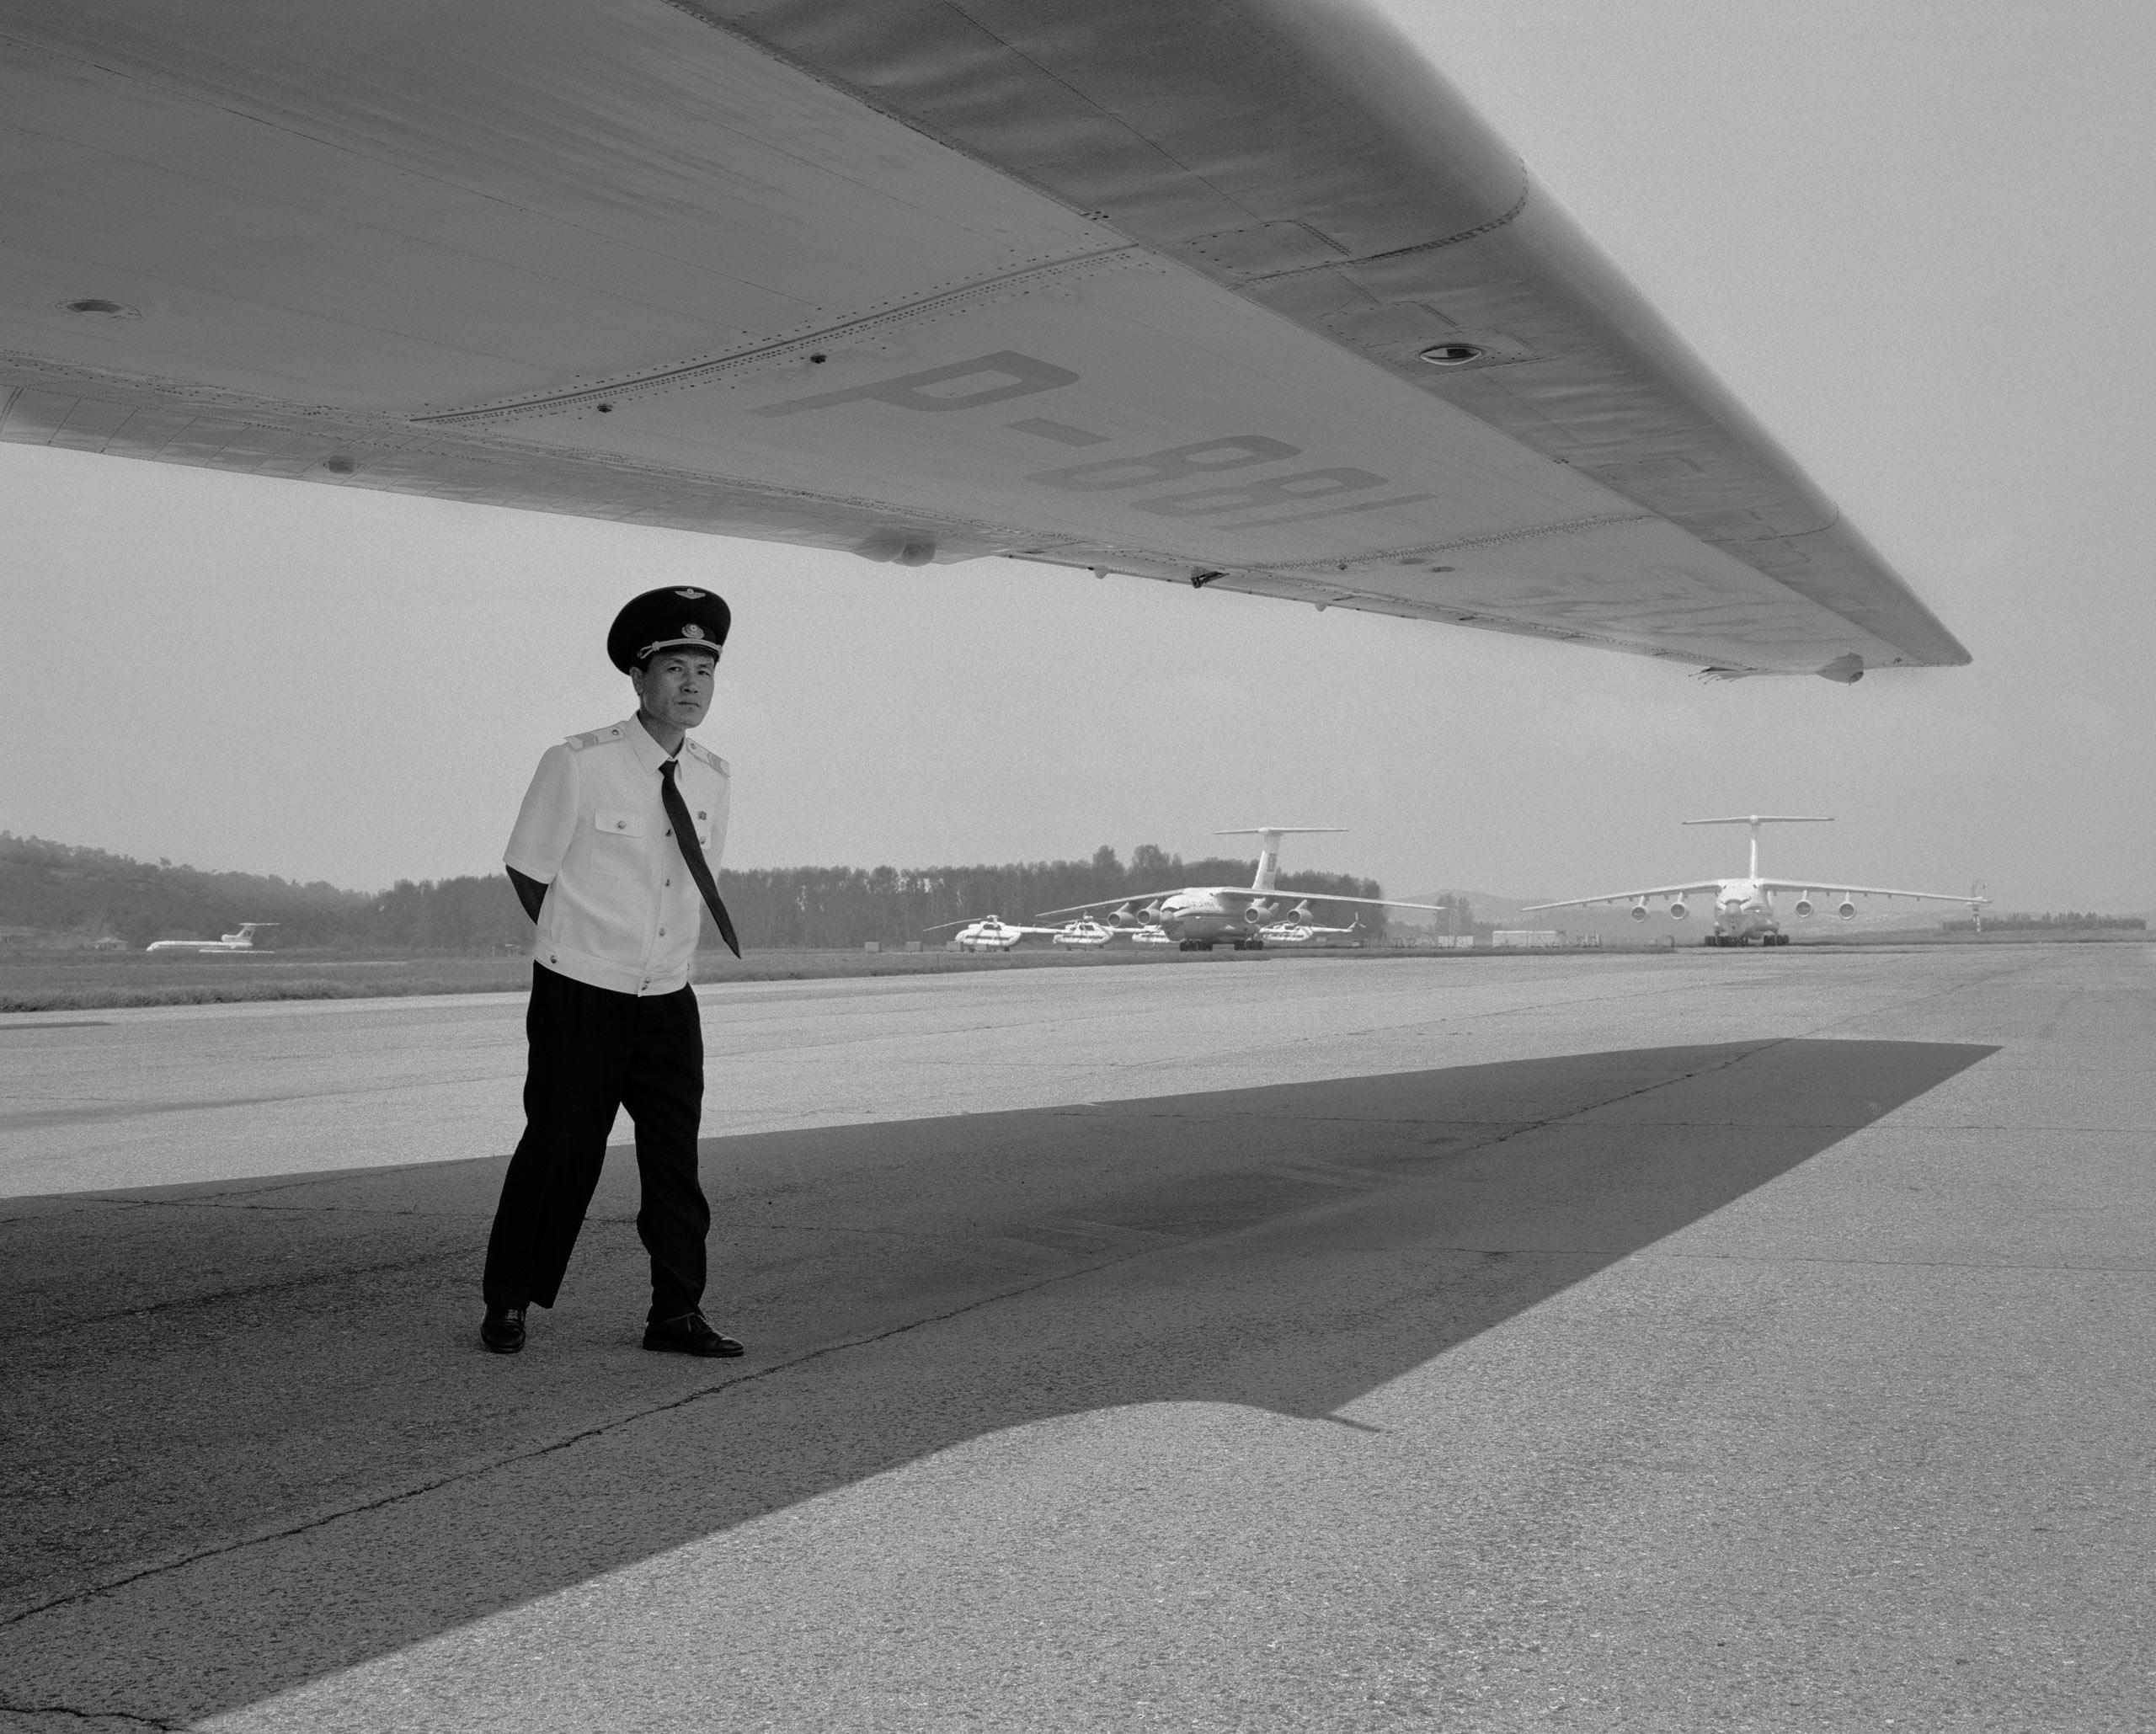 Sunan International Airport, North Korea, 2011.